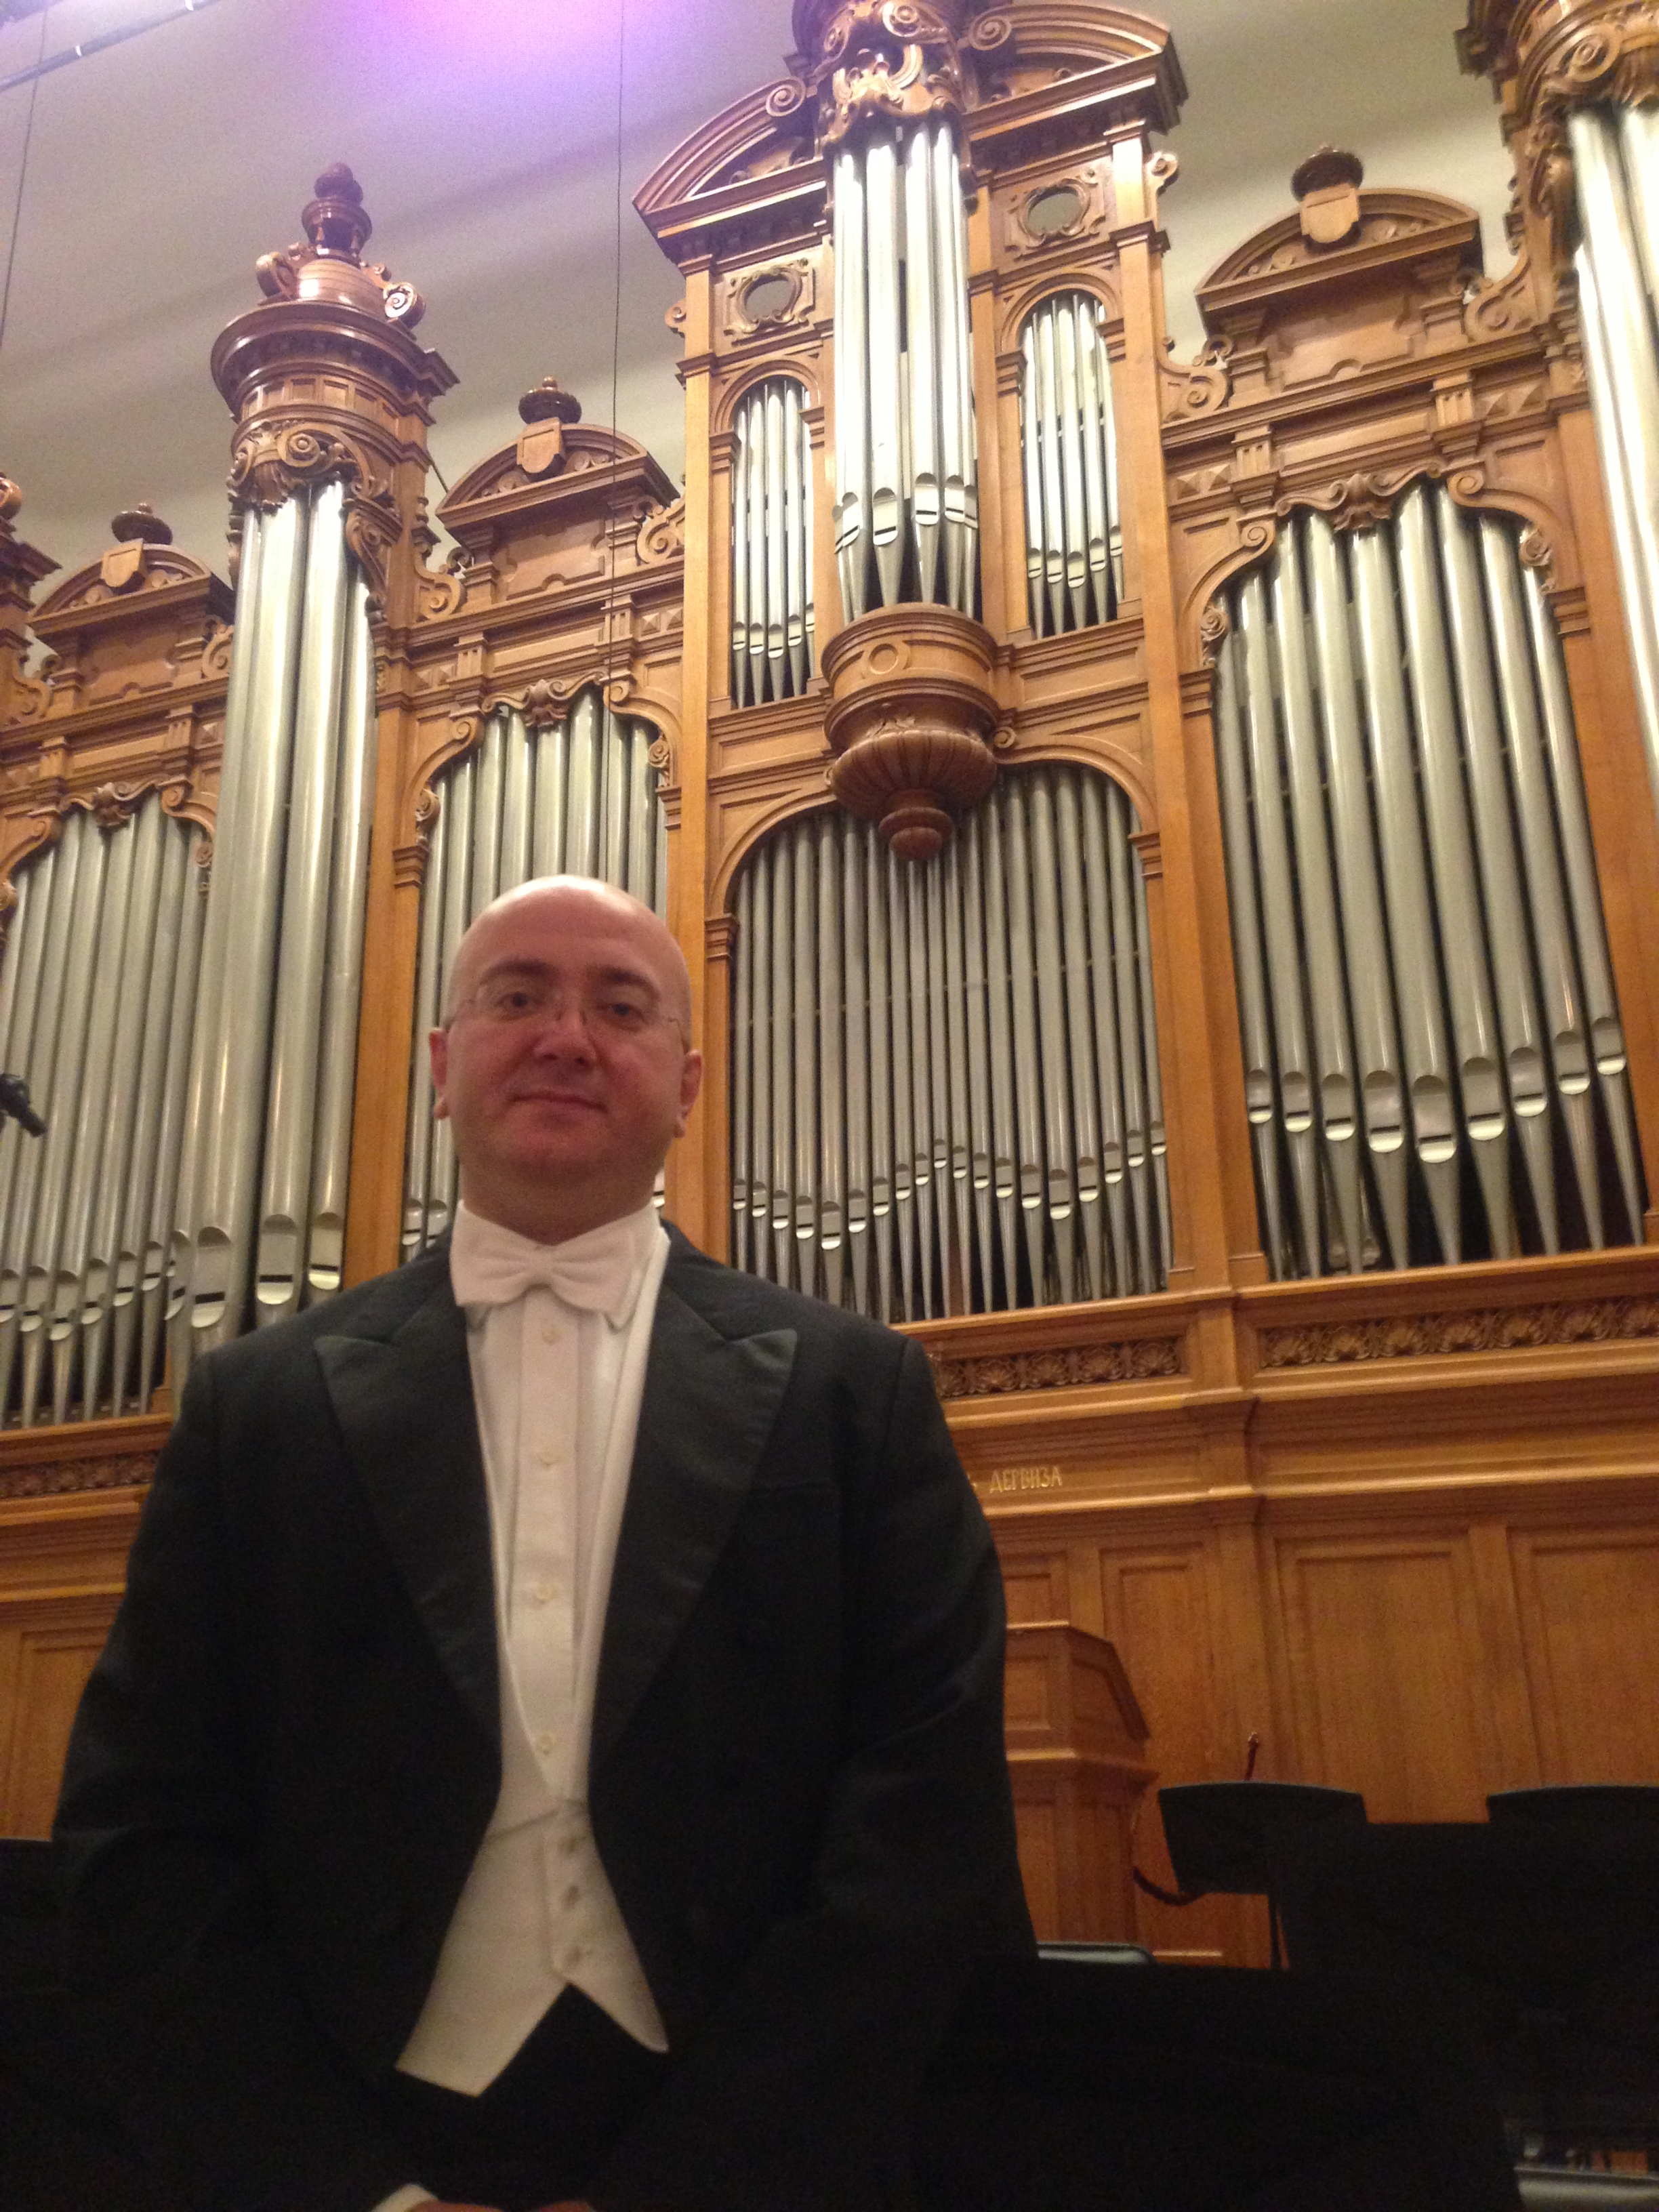 Eugenio-Conservatorio.jpg